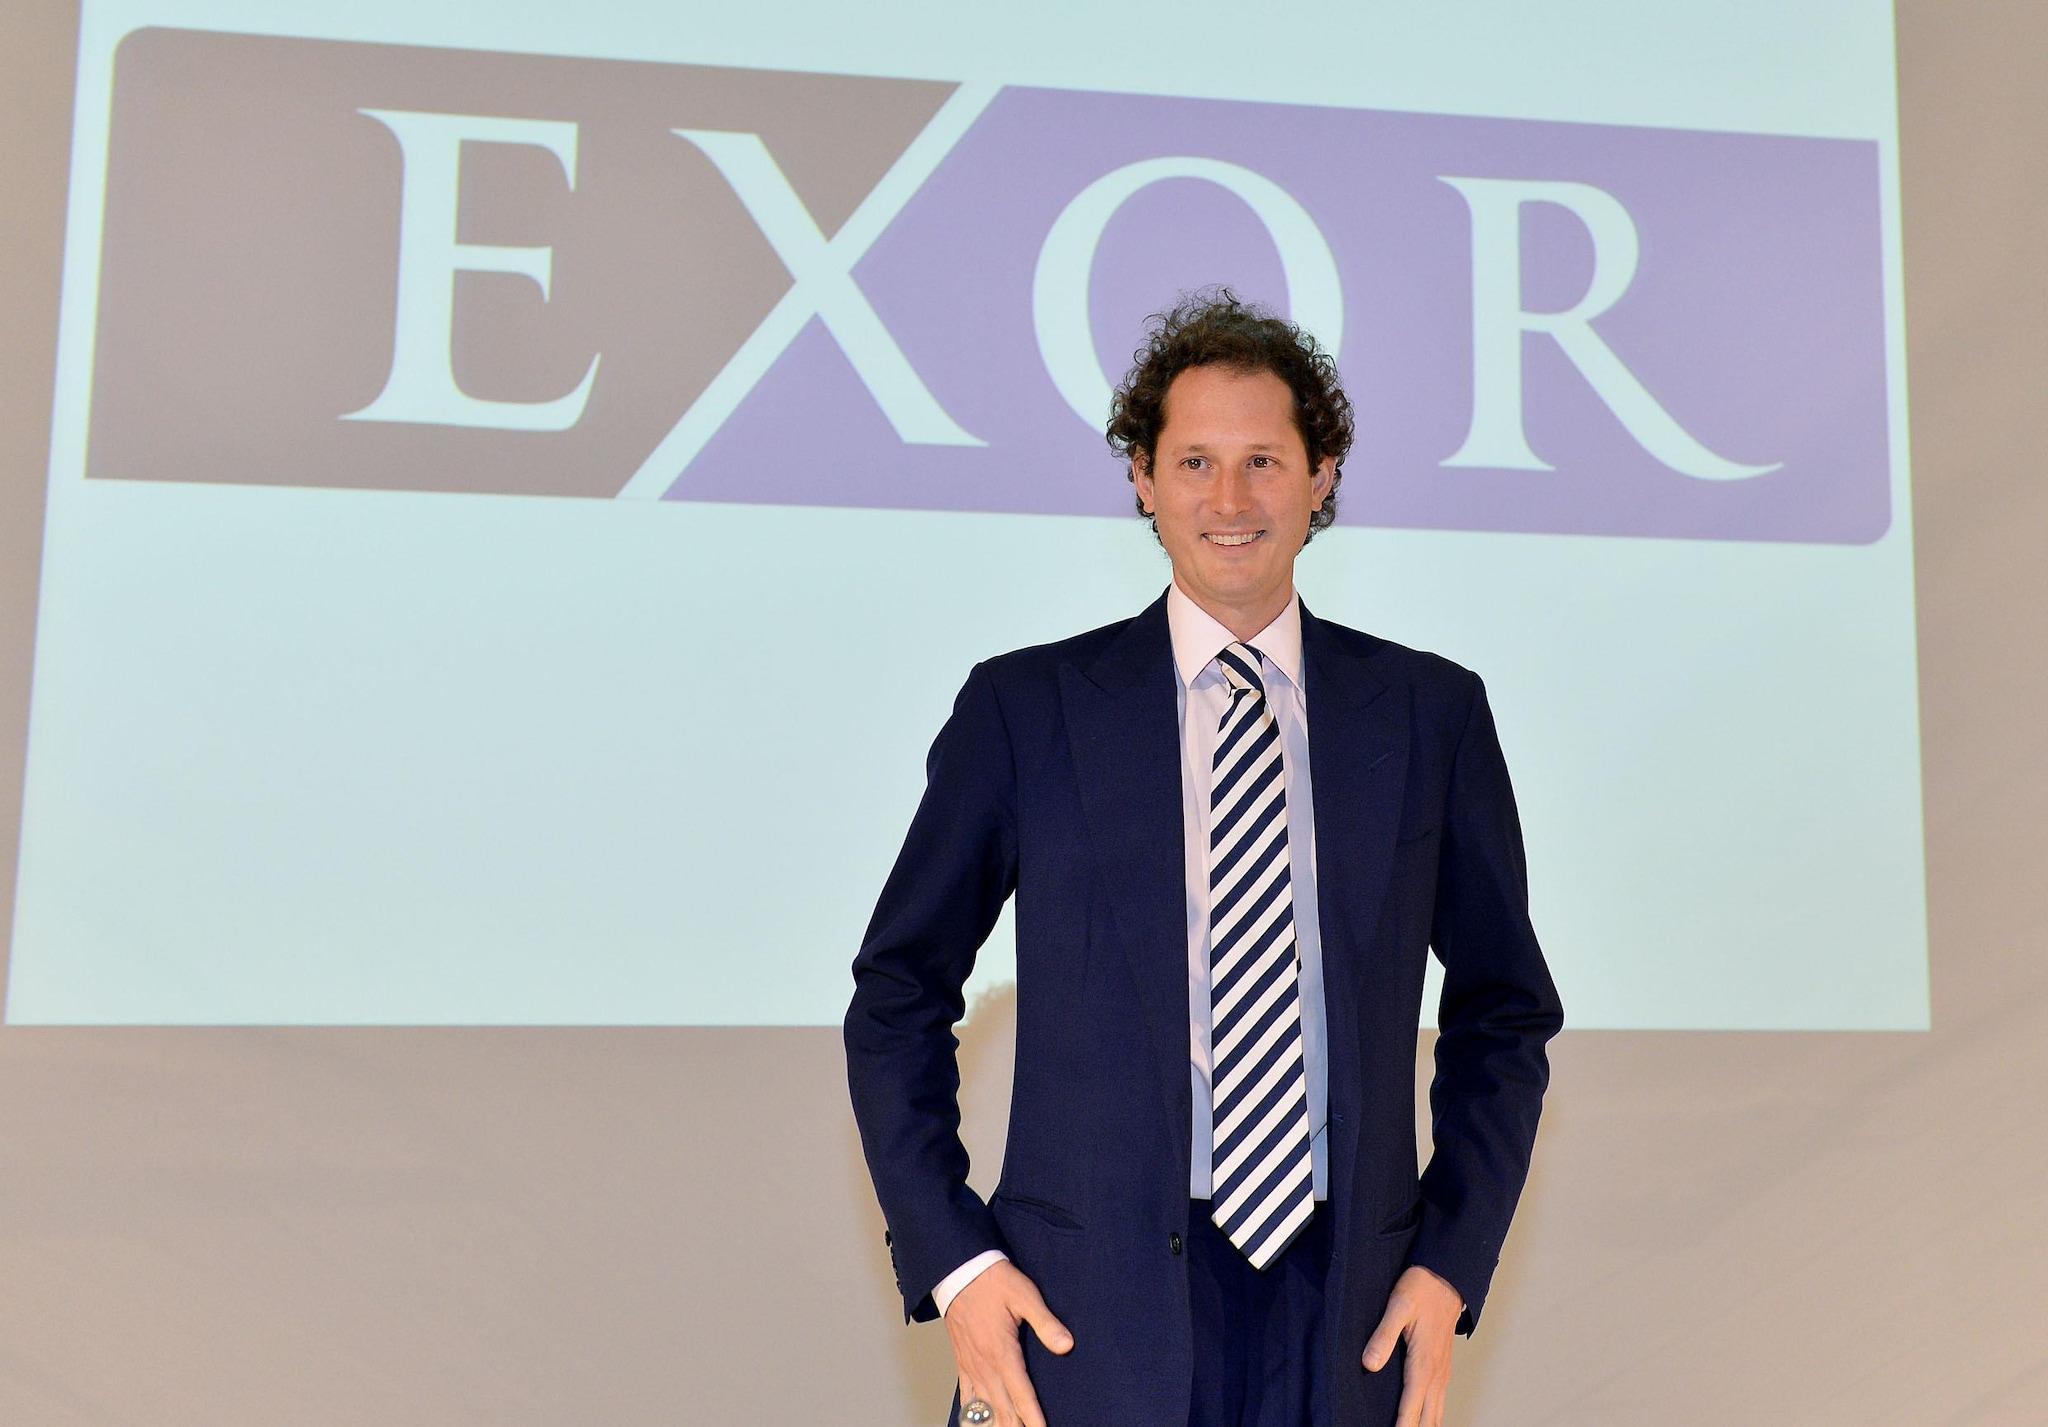 Elkann, Marchionne lascerà Fca nel 2019